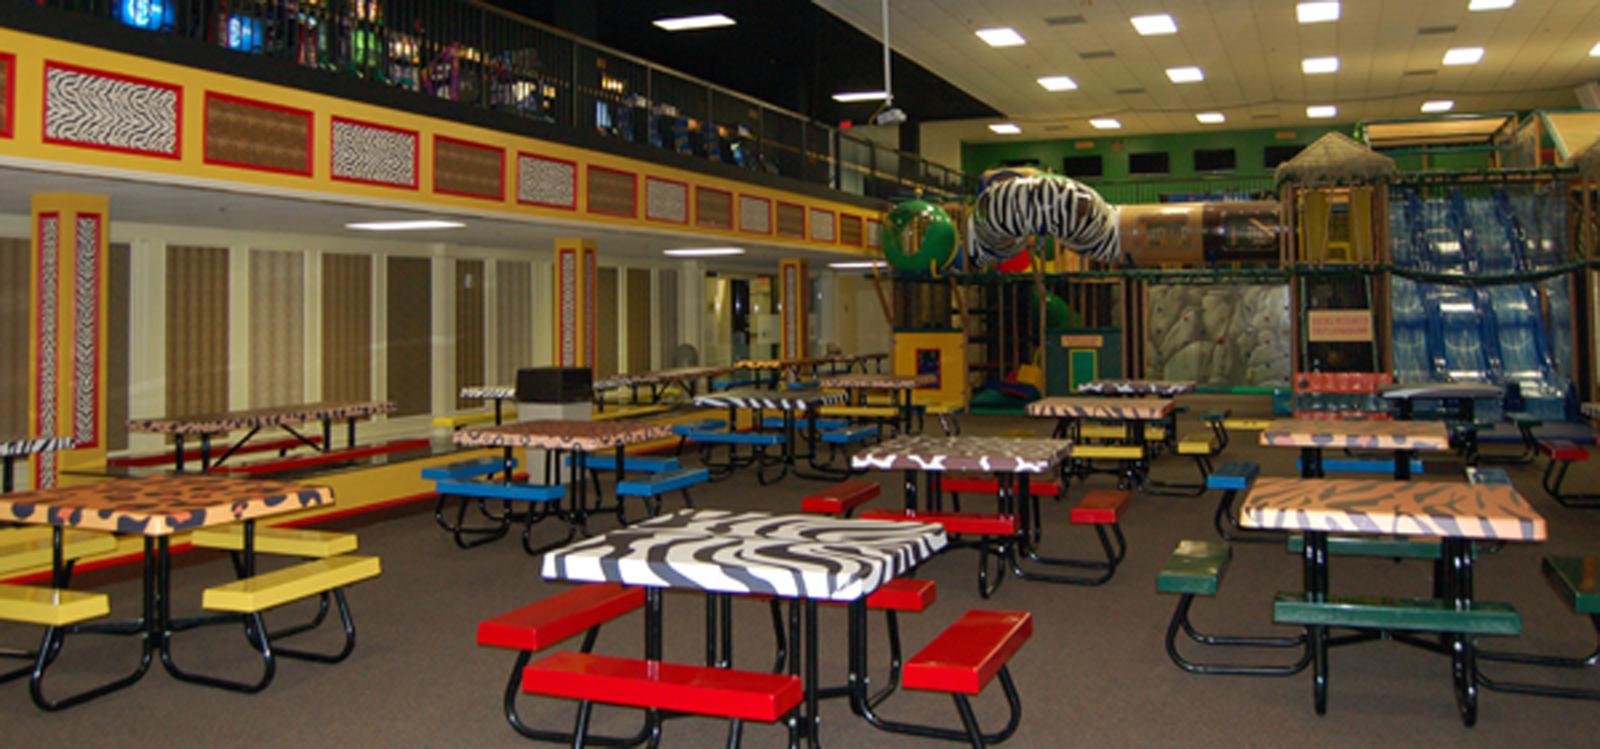 Indoor Playground Indoor Playground Equipment Blog By Iplayco - Children's indoor play area flooring